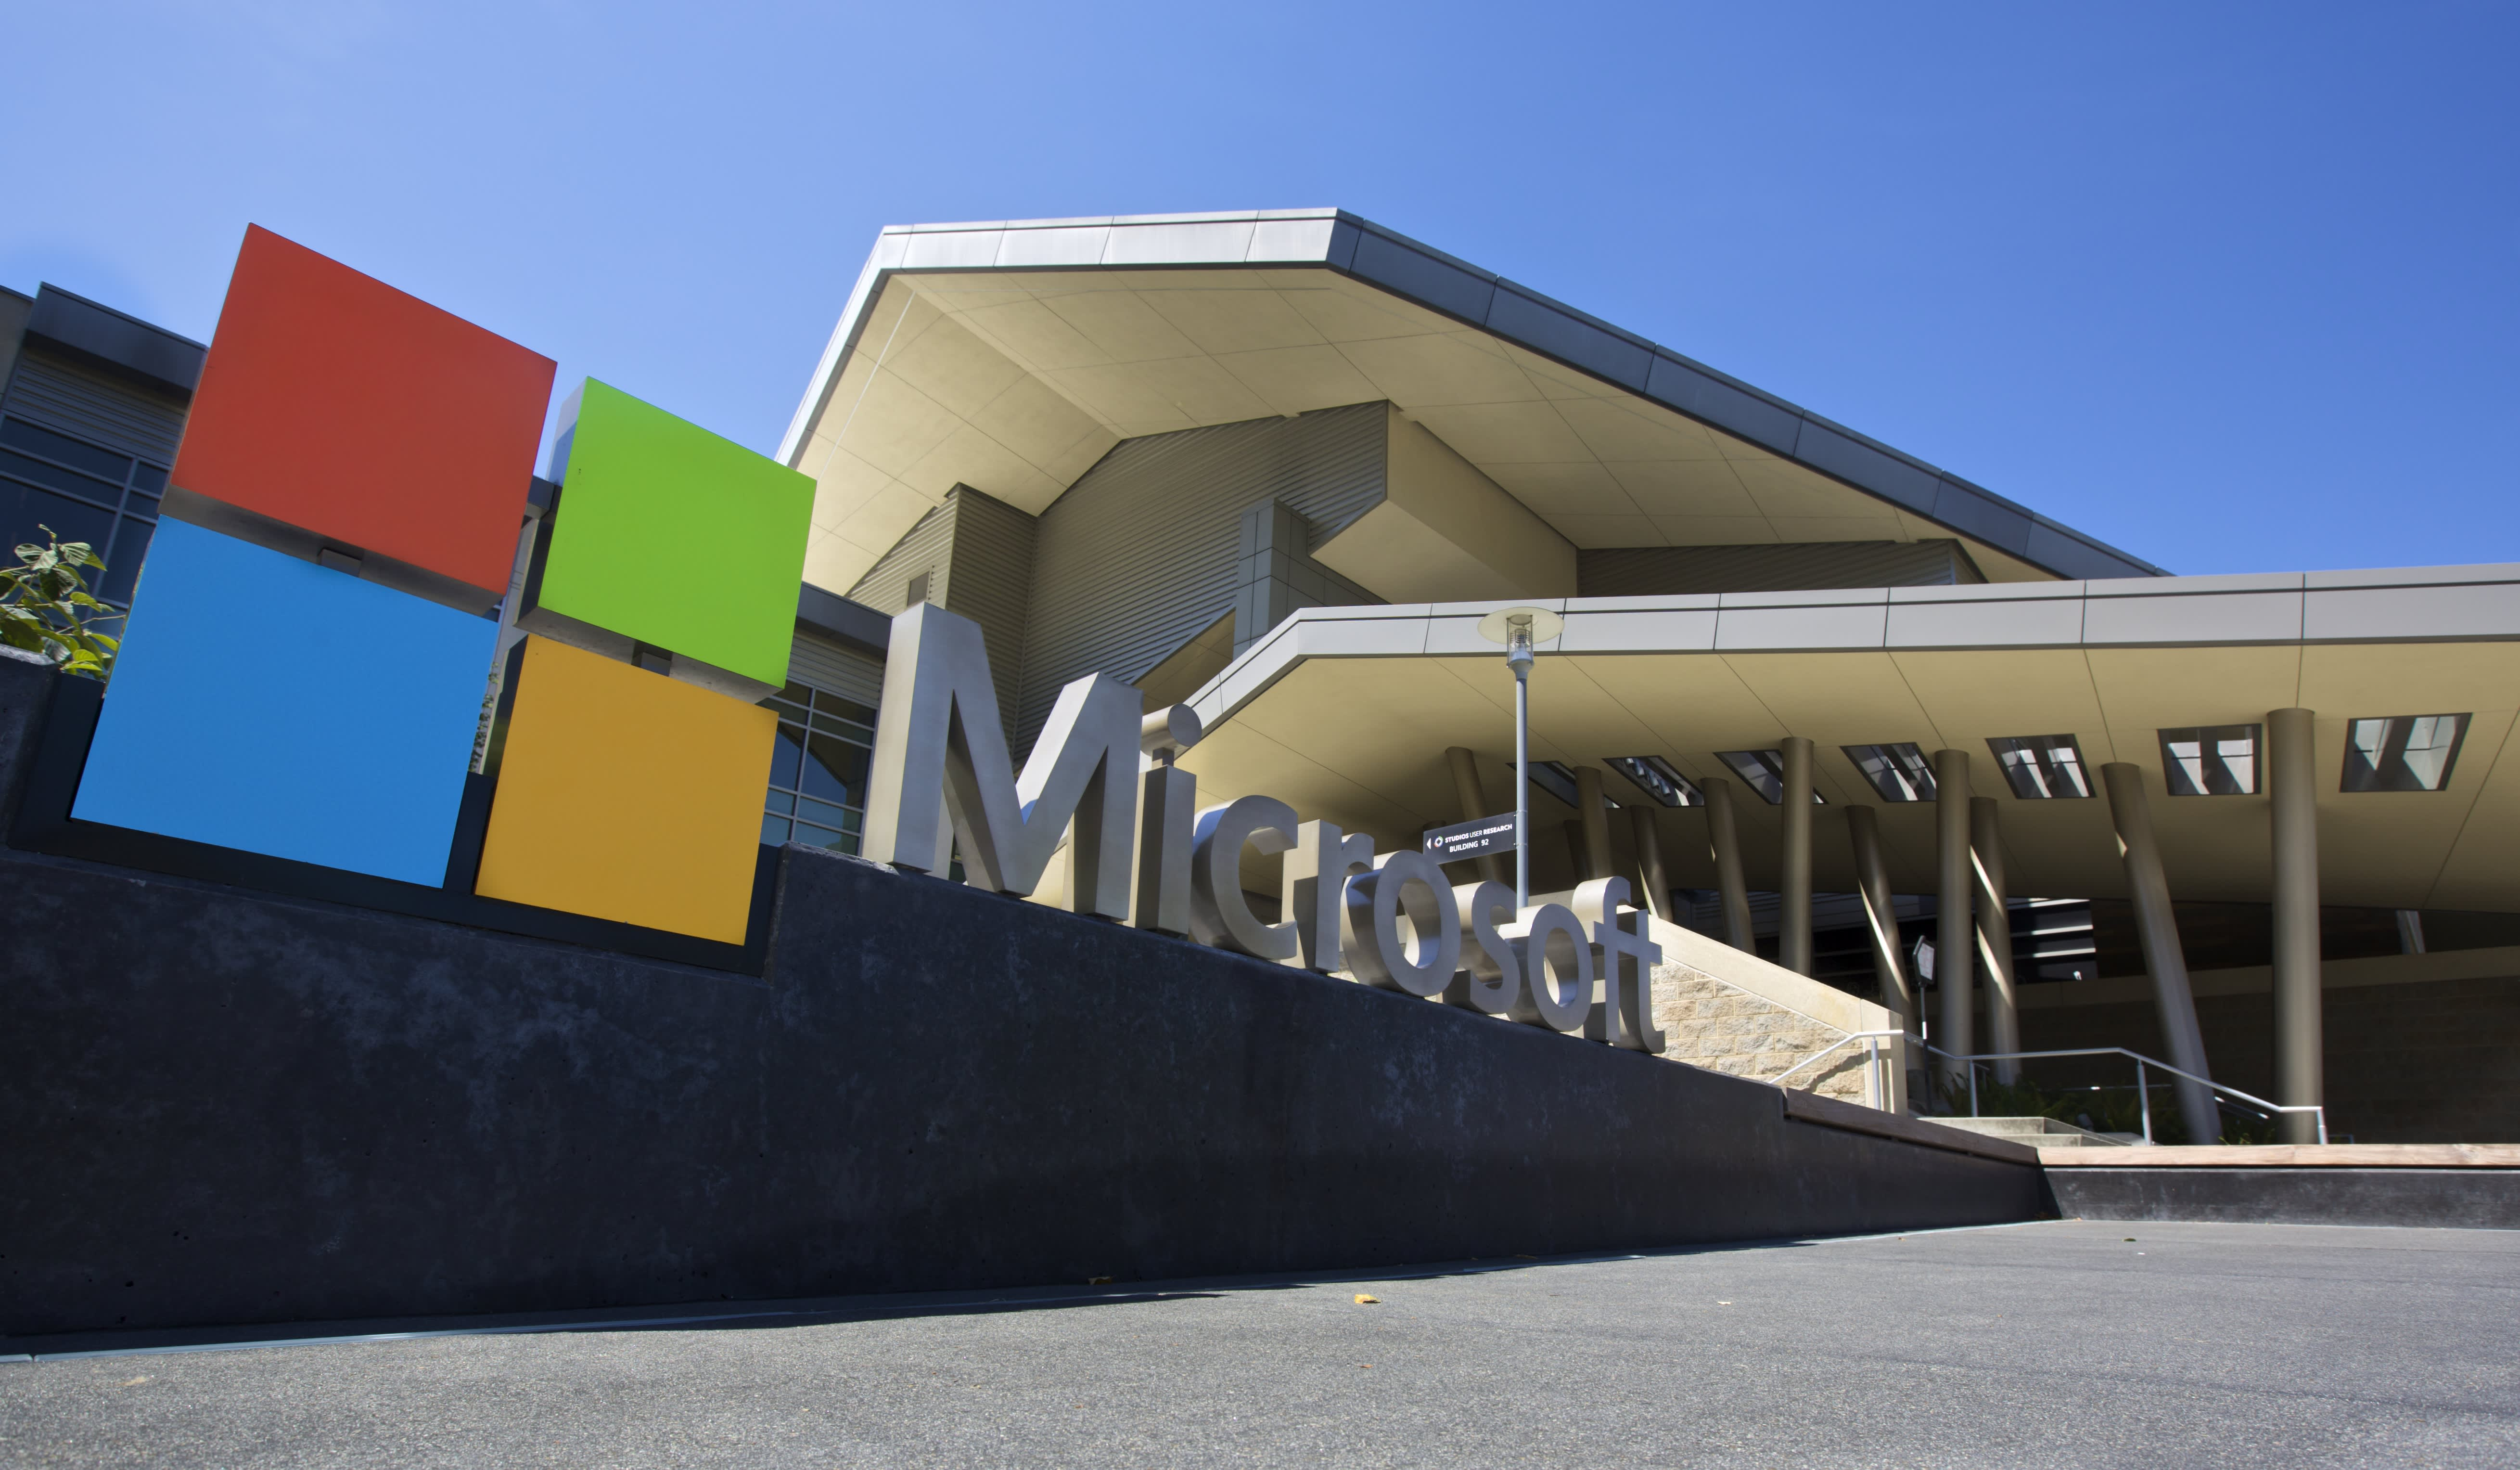 GS: Microsoft